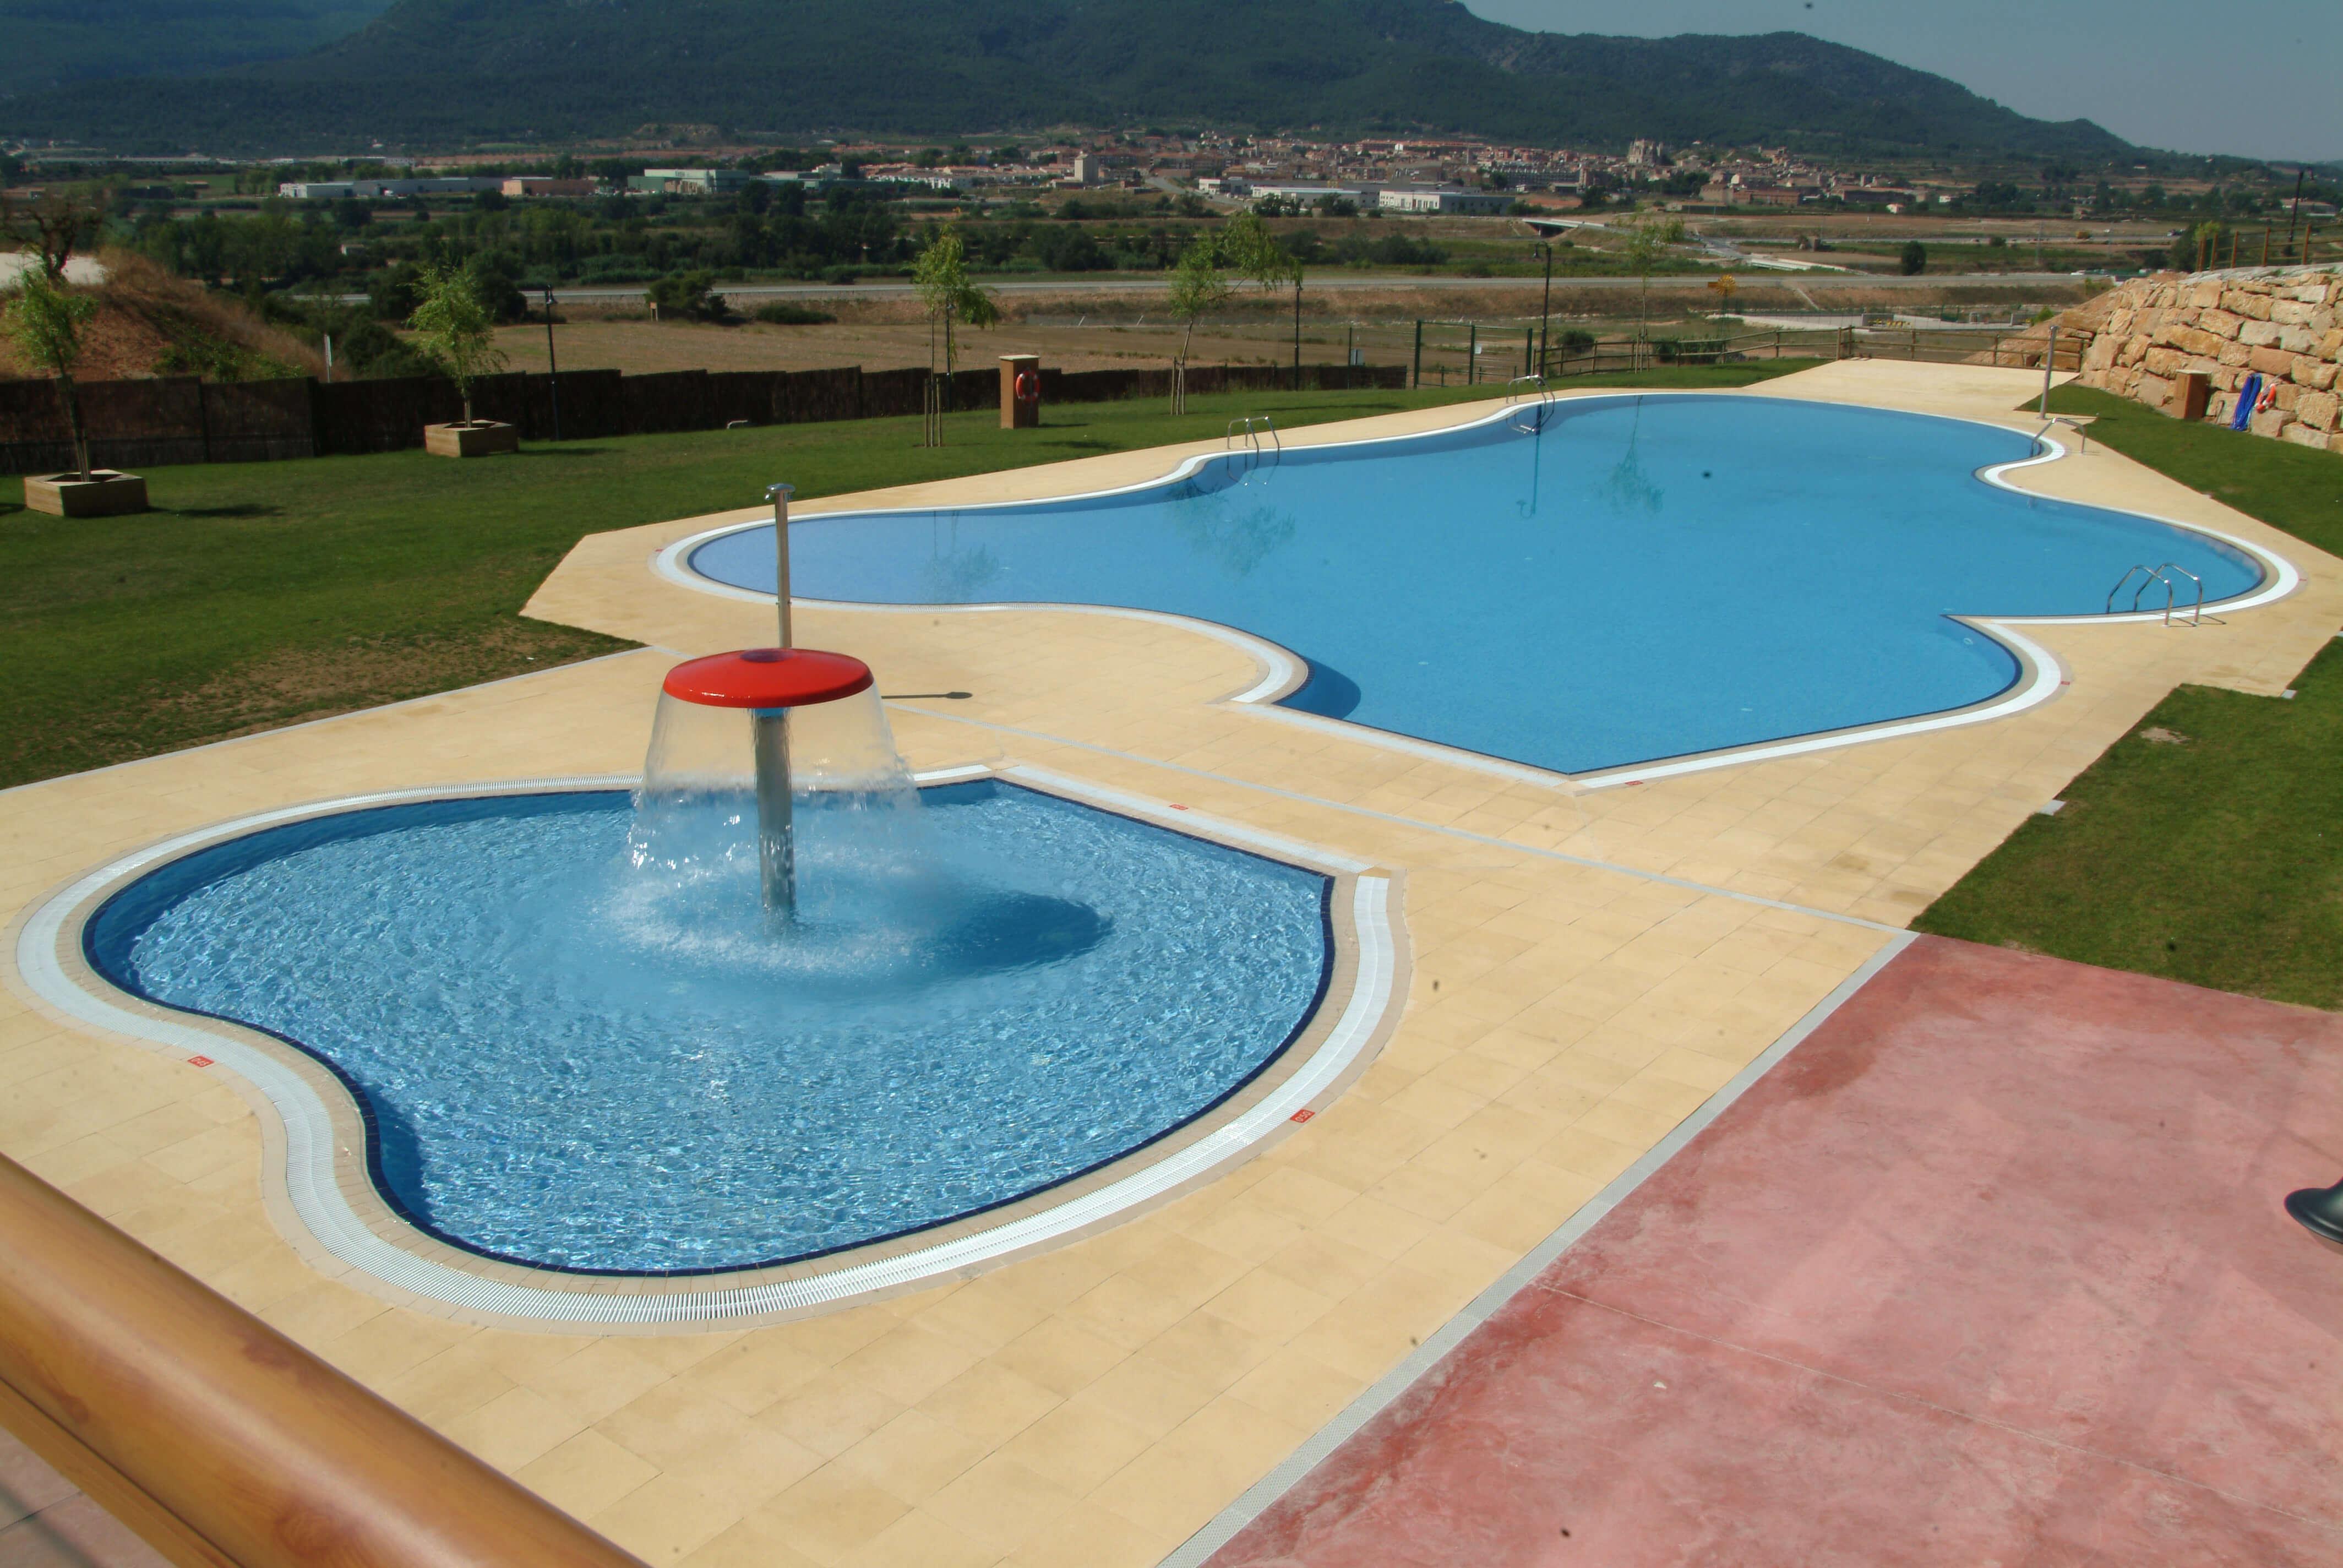 Publicas municipales 11 piscinas condal - Piscinas municipales en barcelona ...